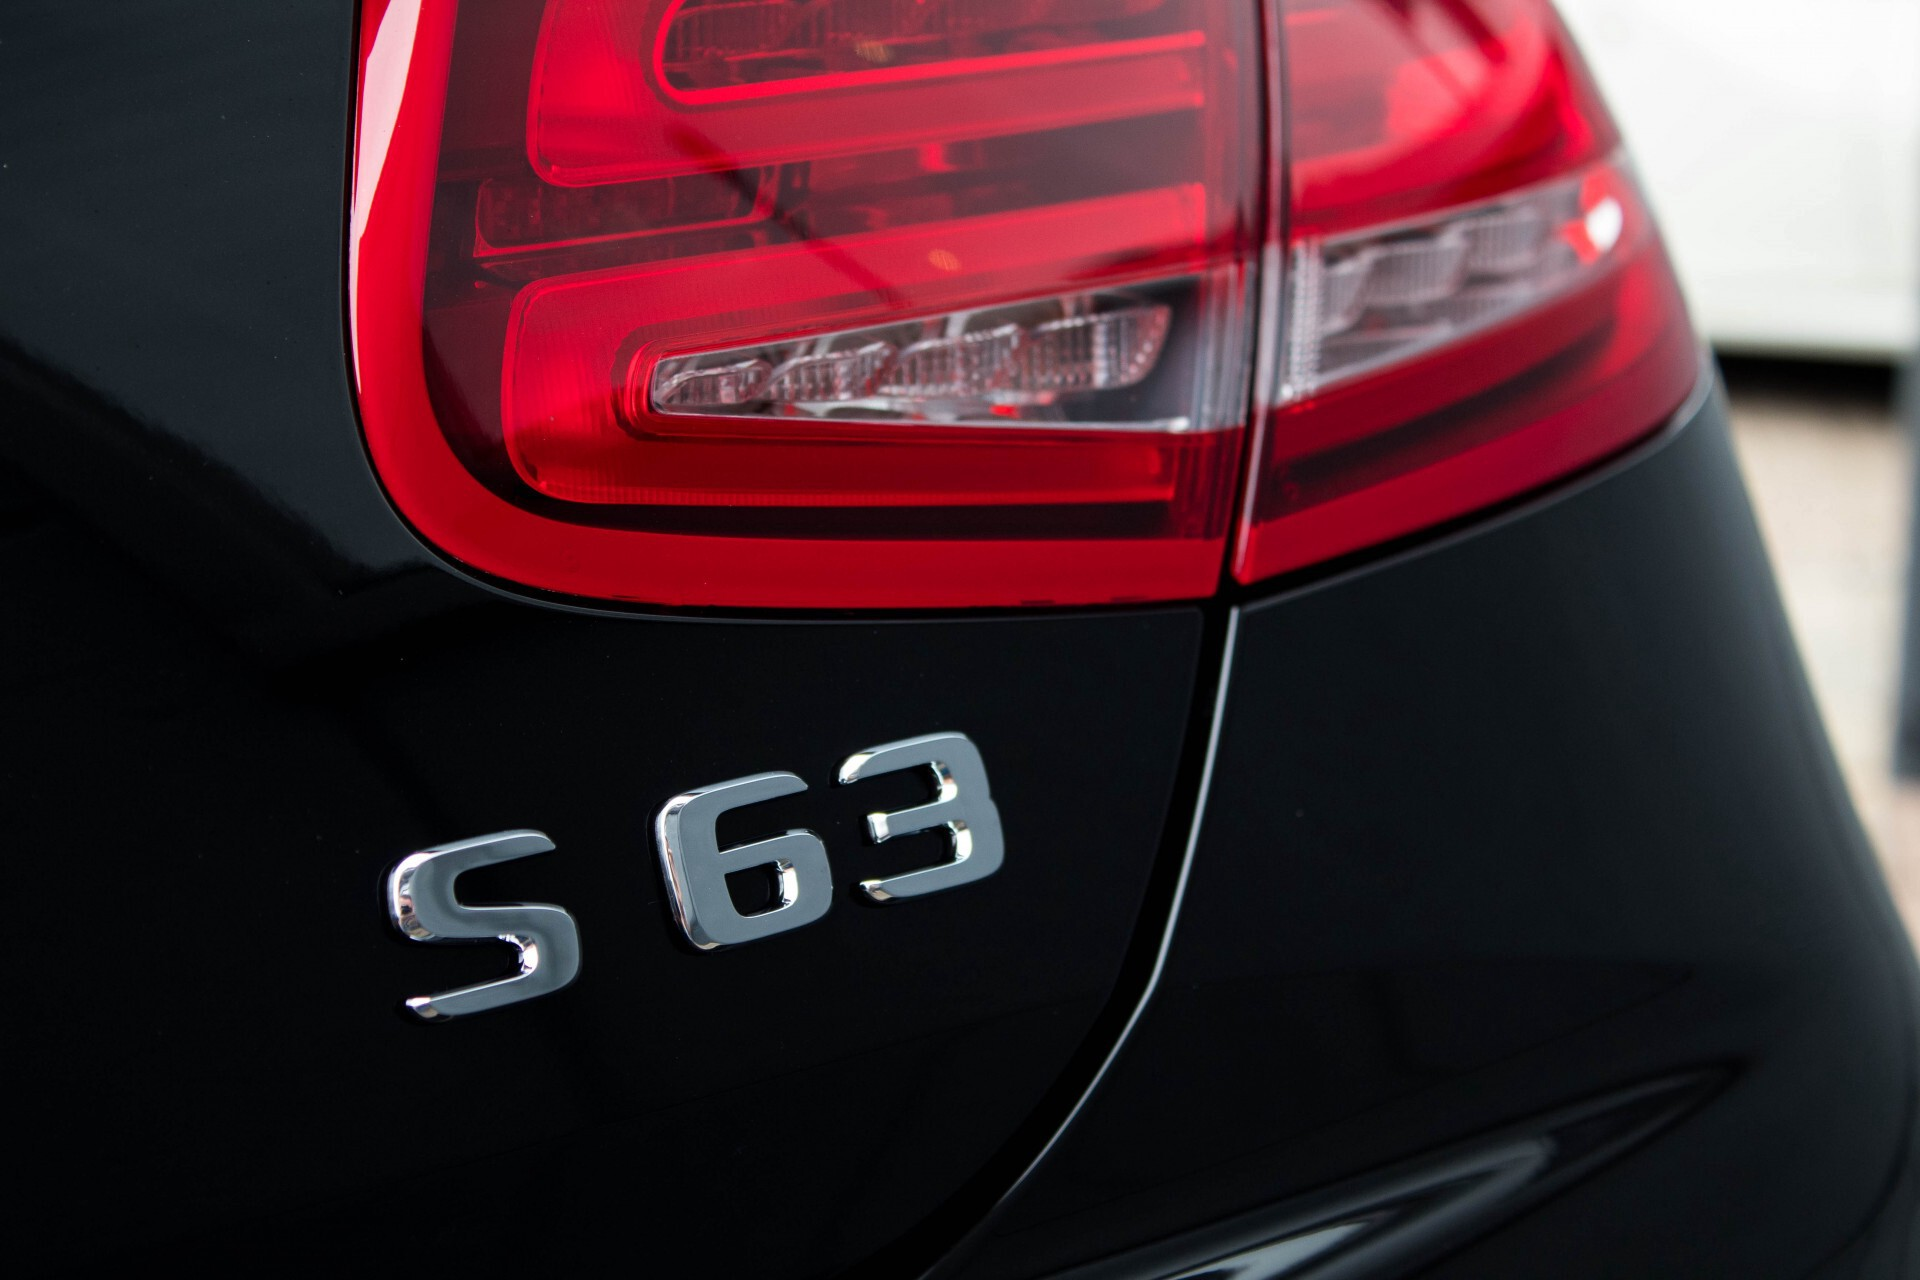 Mercedes-Benz S-Klasse Cabrio 63 AMG 4-M Ceramic/Designo/Carbon/Burmester High End Aut Foto 66